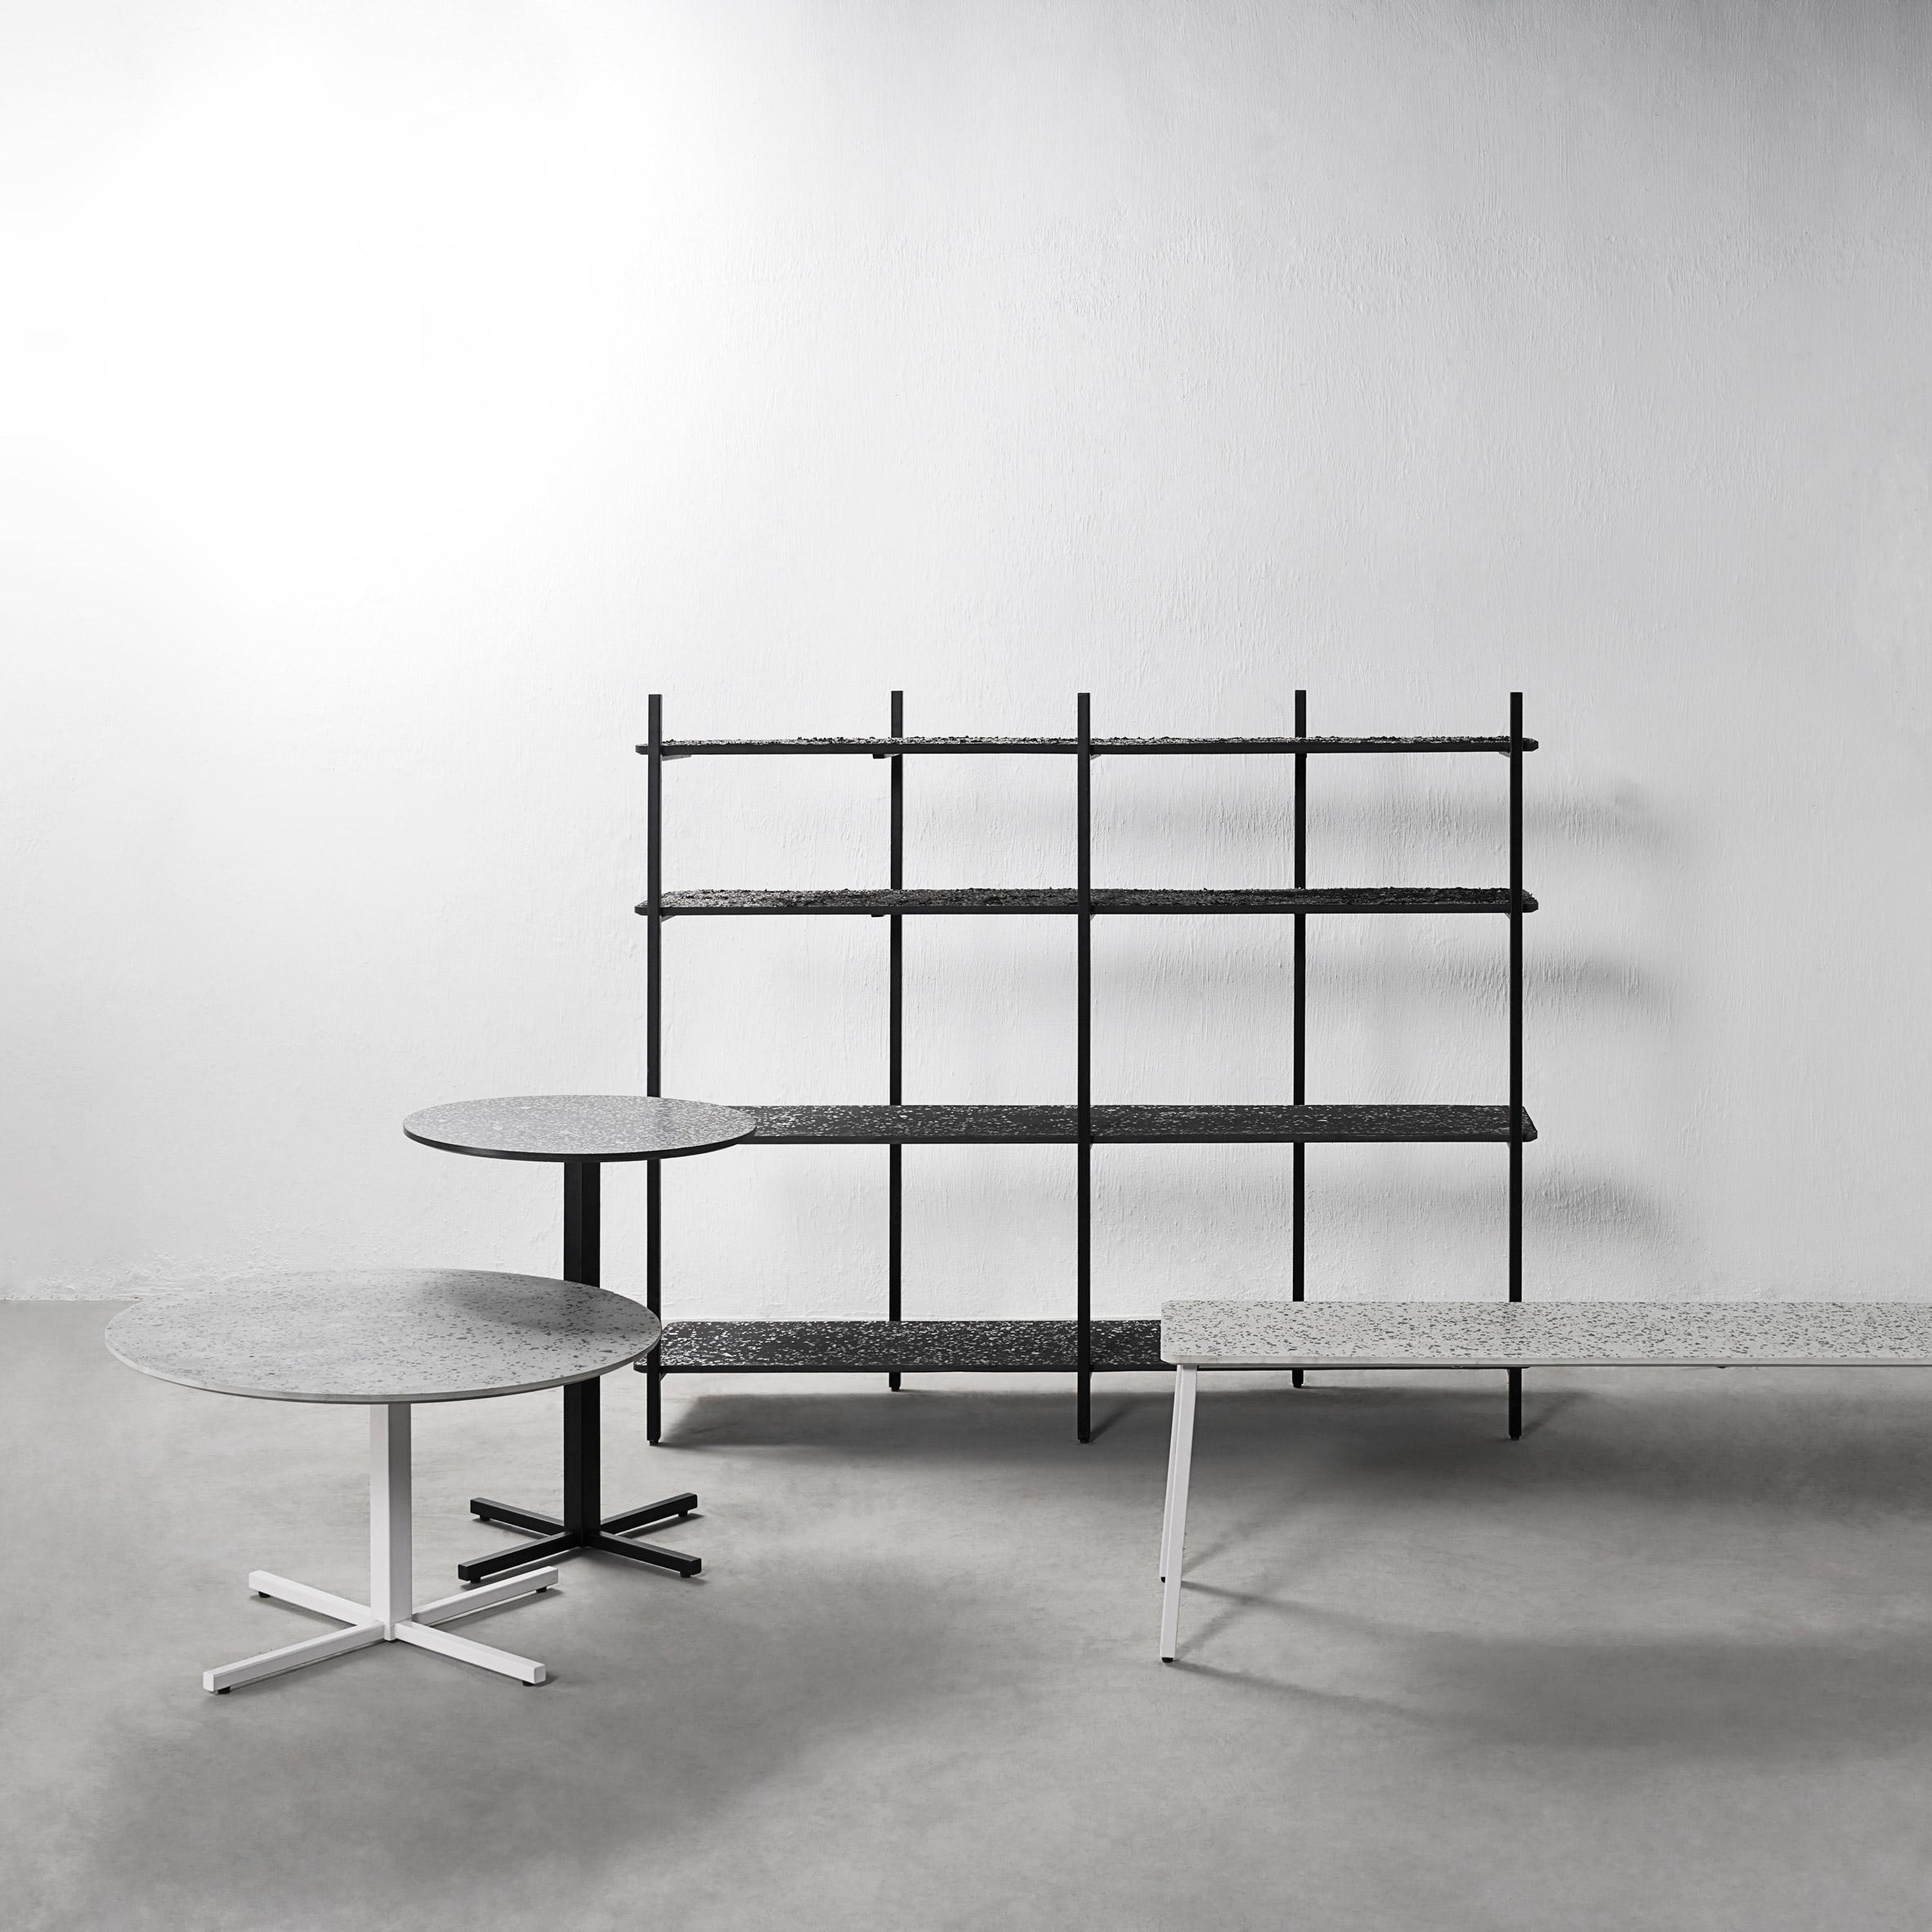 Bentu Design makes terrazzo furniture using recycled ceramic waste